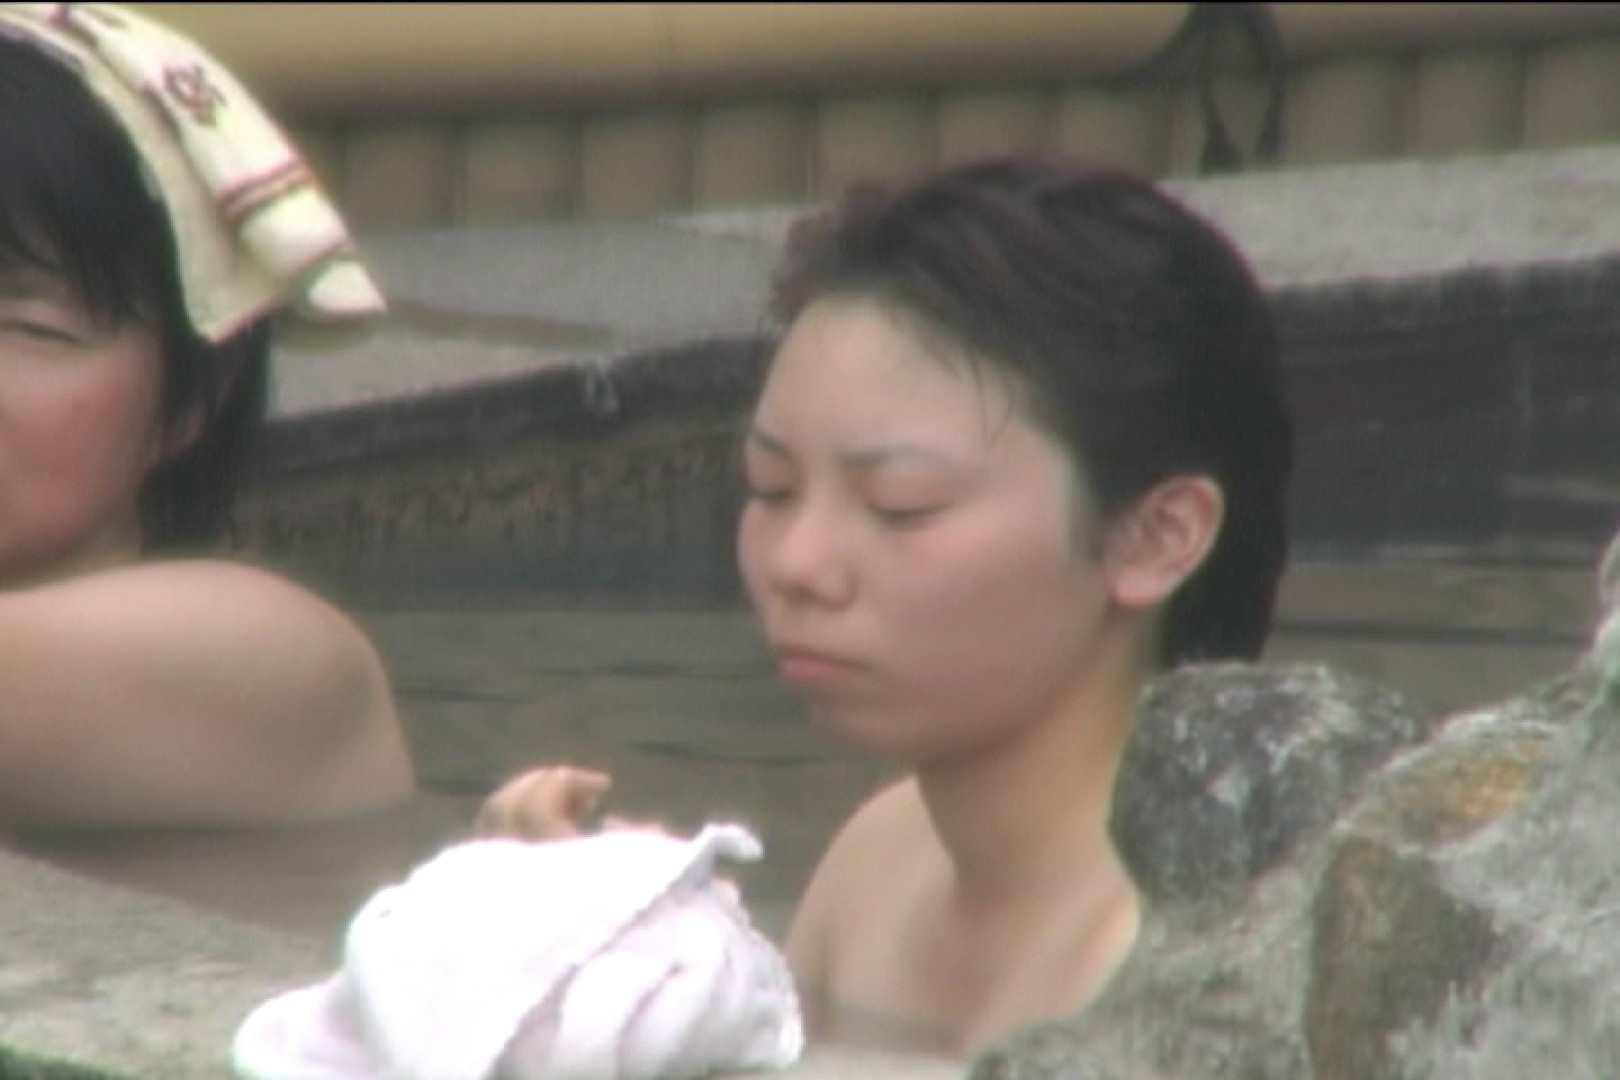 Aquaな露天風呂Vol.122 露天風呂編  92PIX 72